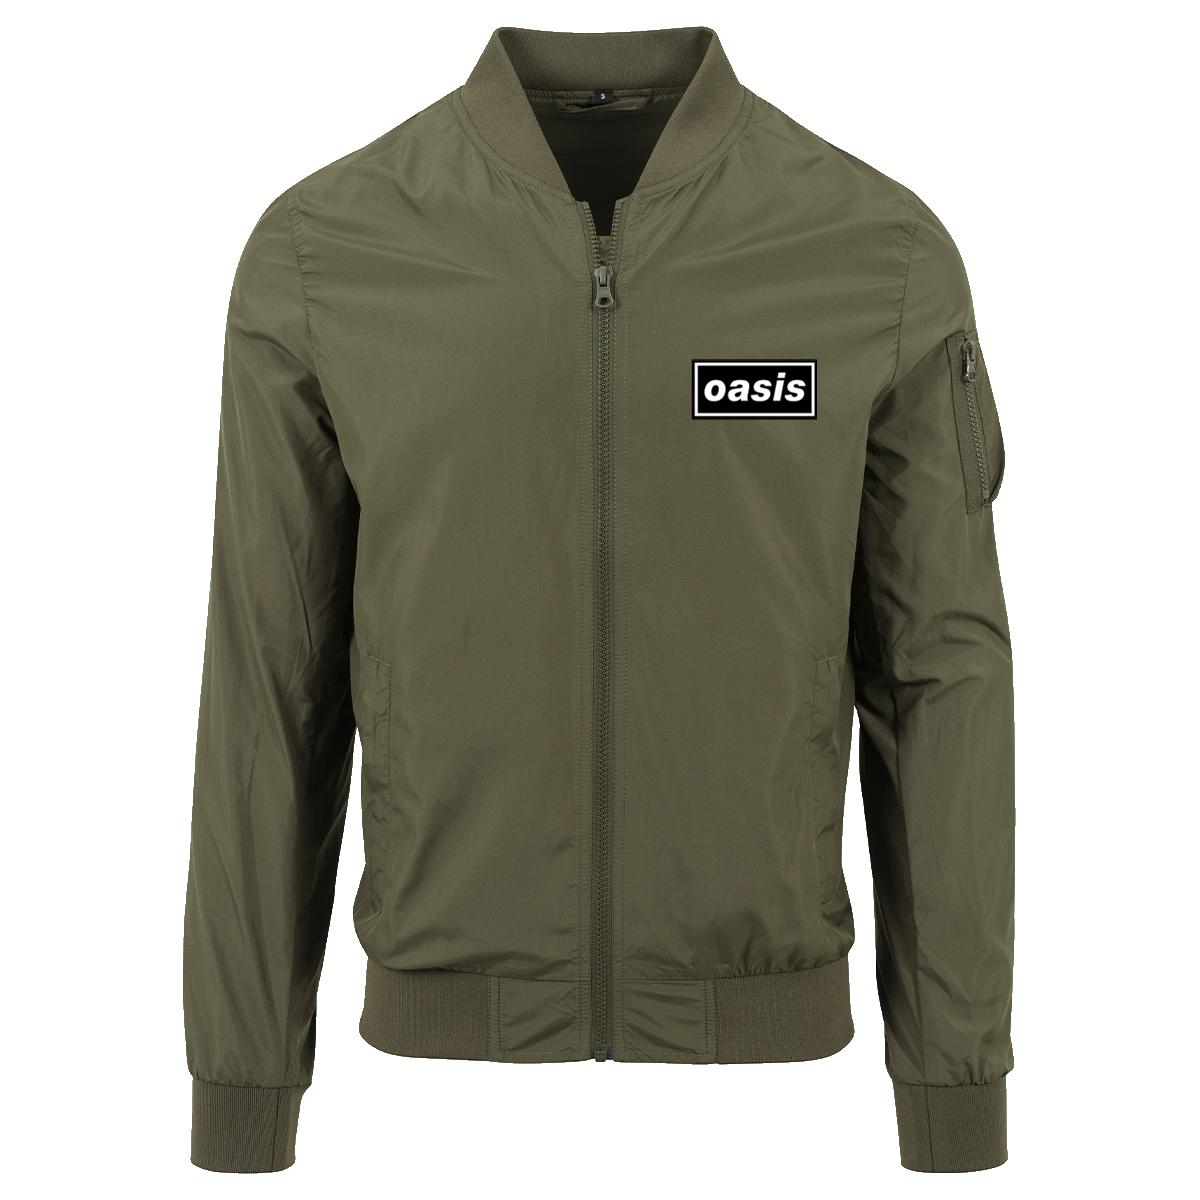 Buy Online Oasis - Oasis Green Bomber Jacket